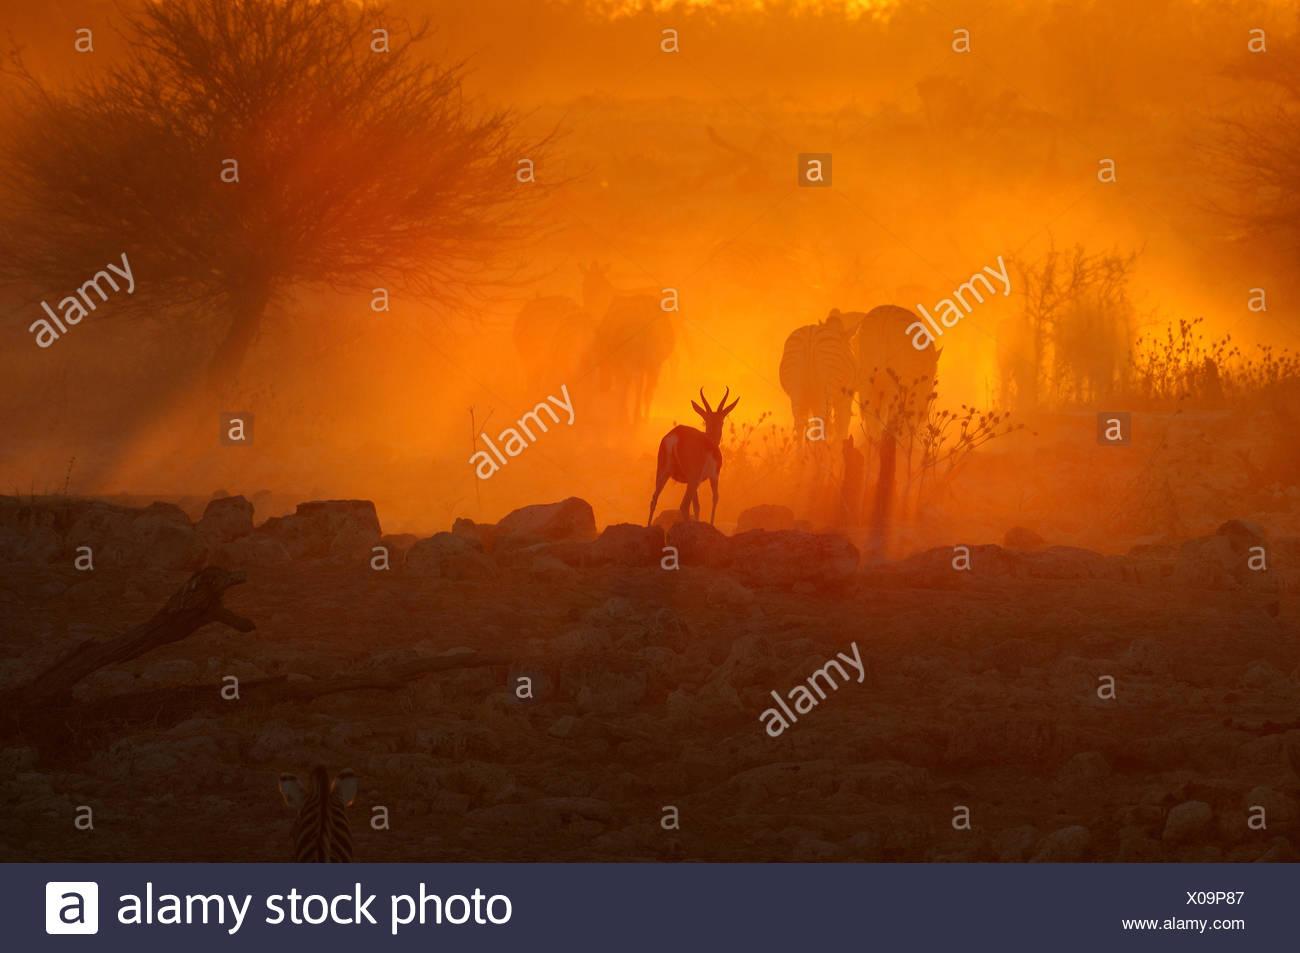 Sunset at Okaukeujo, Namibia - Stock Image